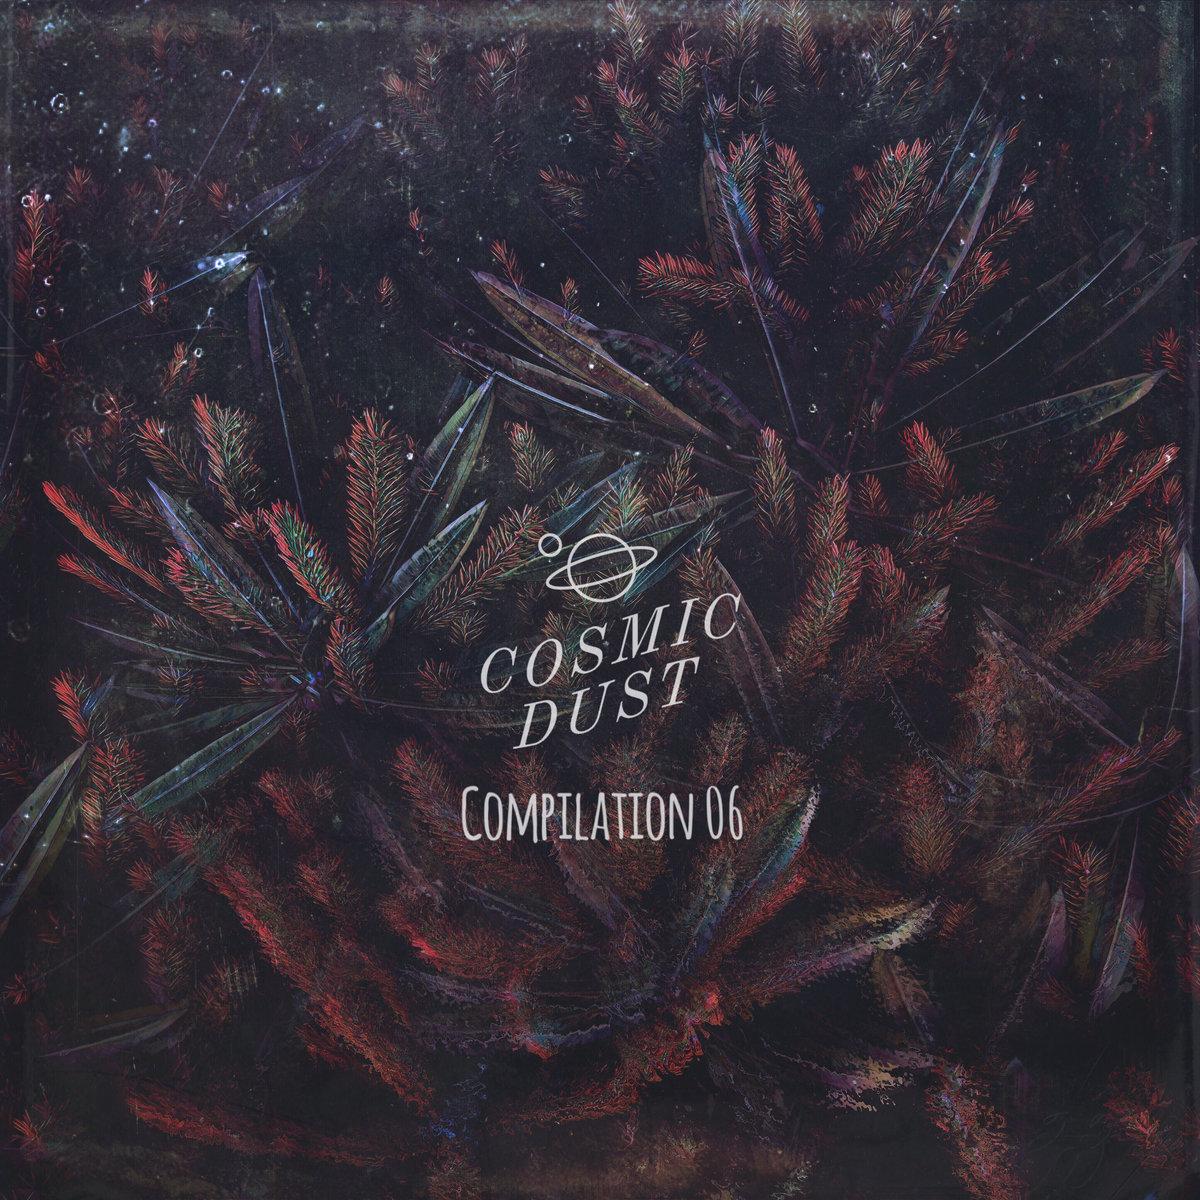 Cosmic Dust Compilation06